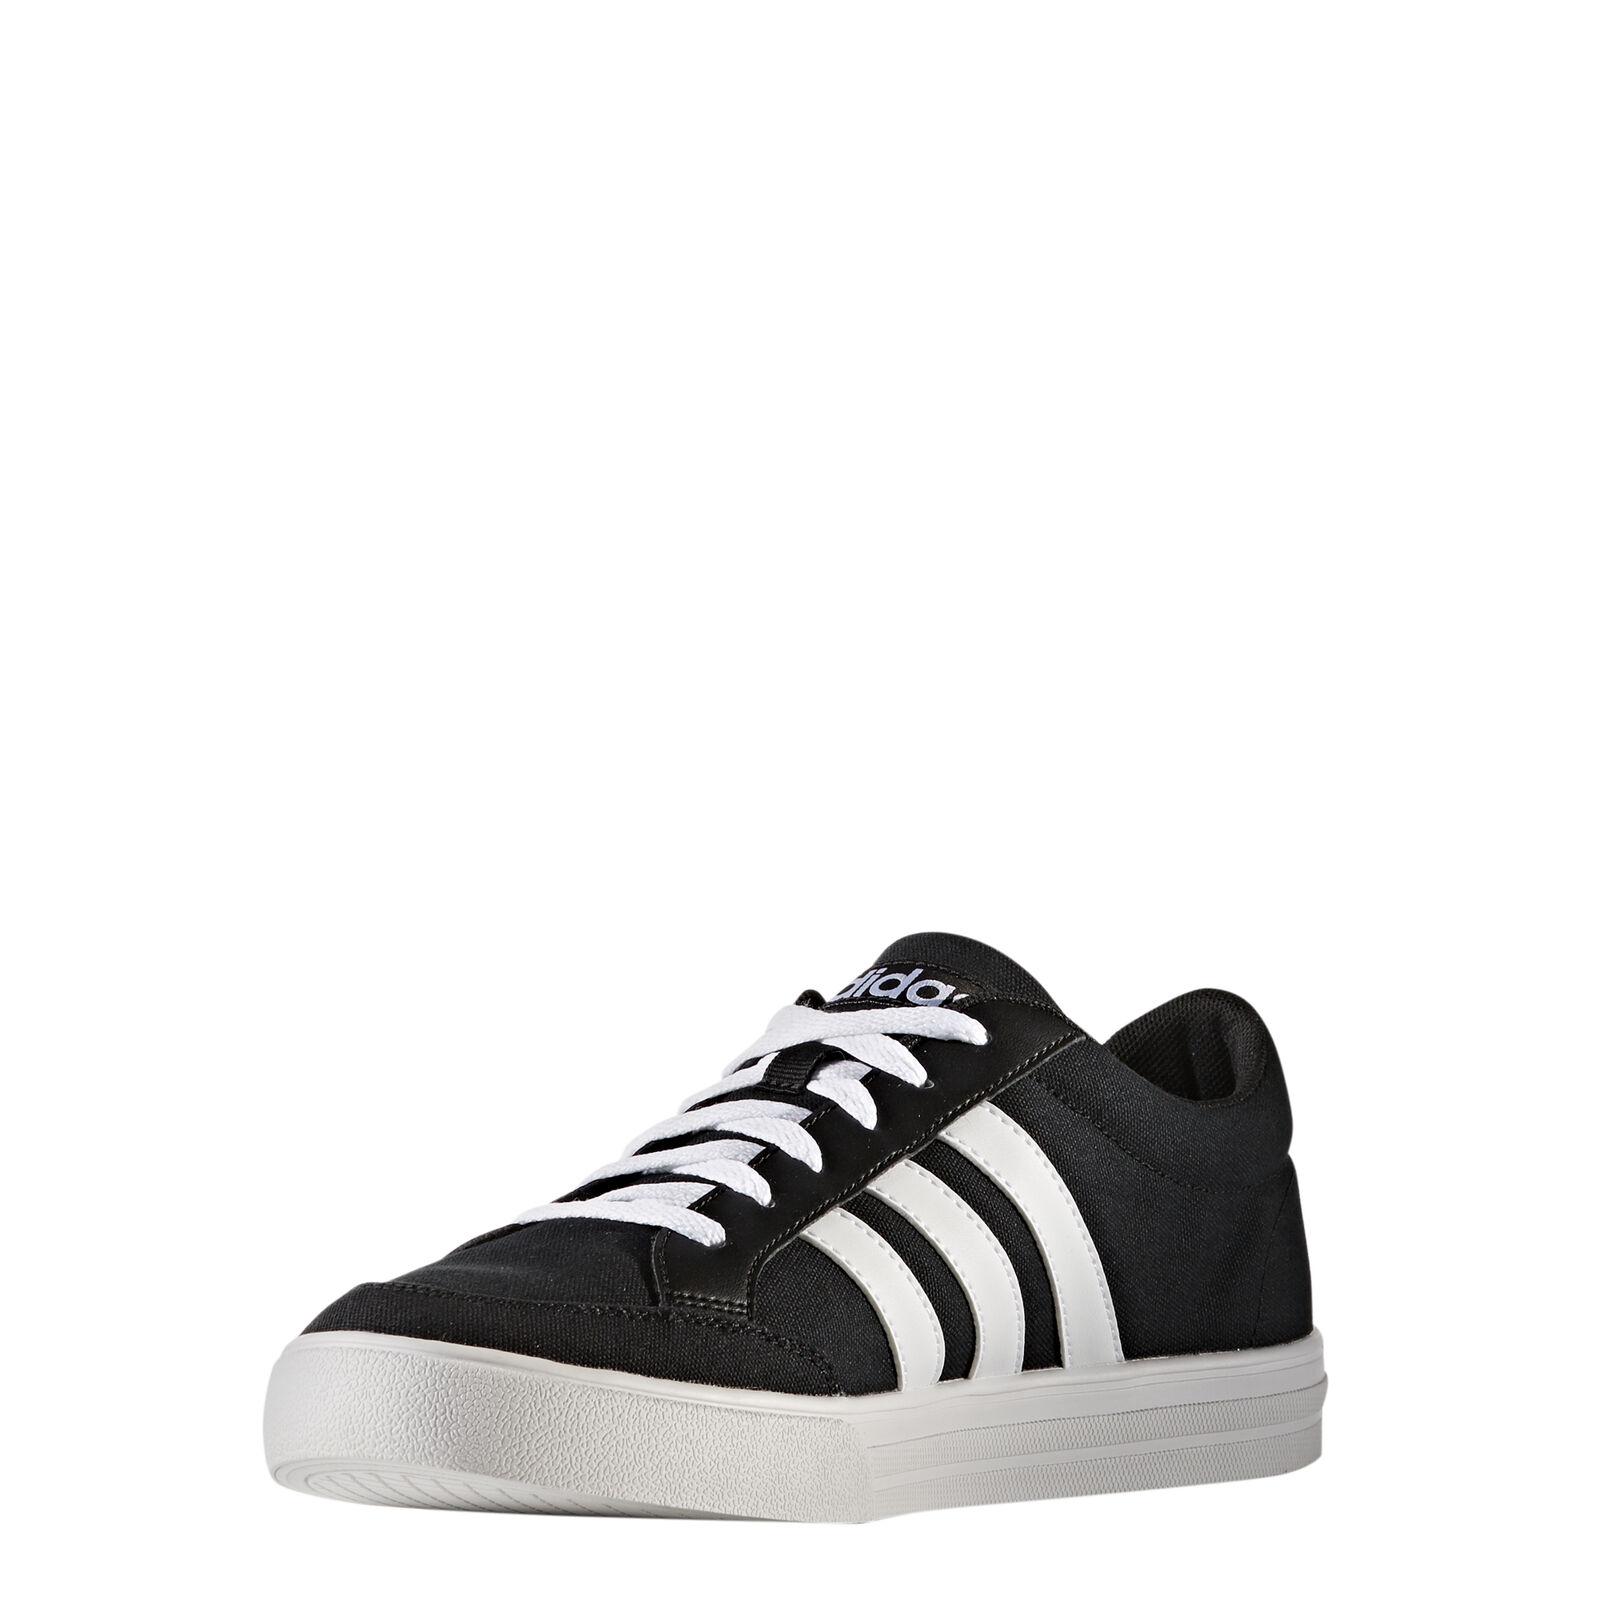 adidas Sneakers VS SET Sneakers Lifestyleschuhe Sommerschuhe Slipper Sportschuhe